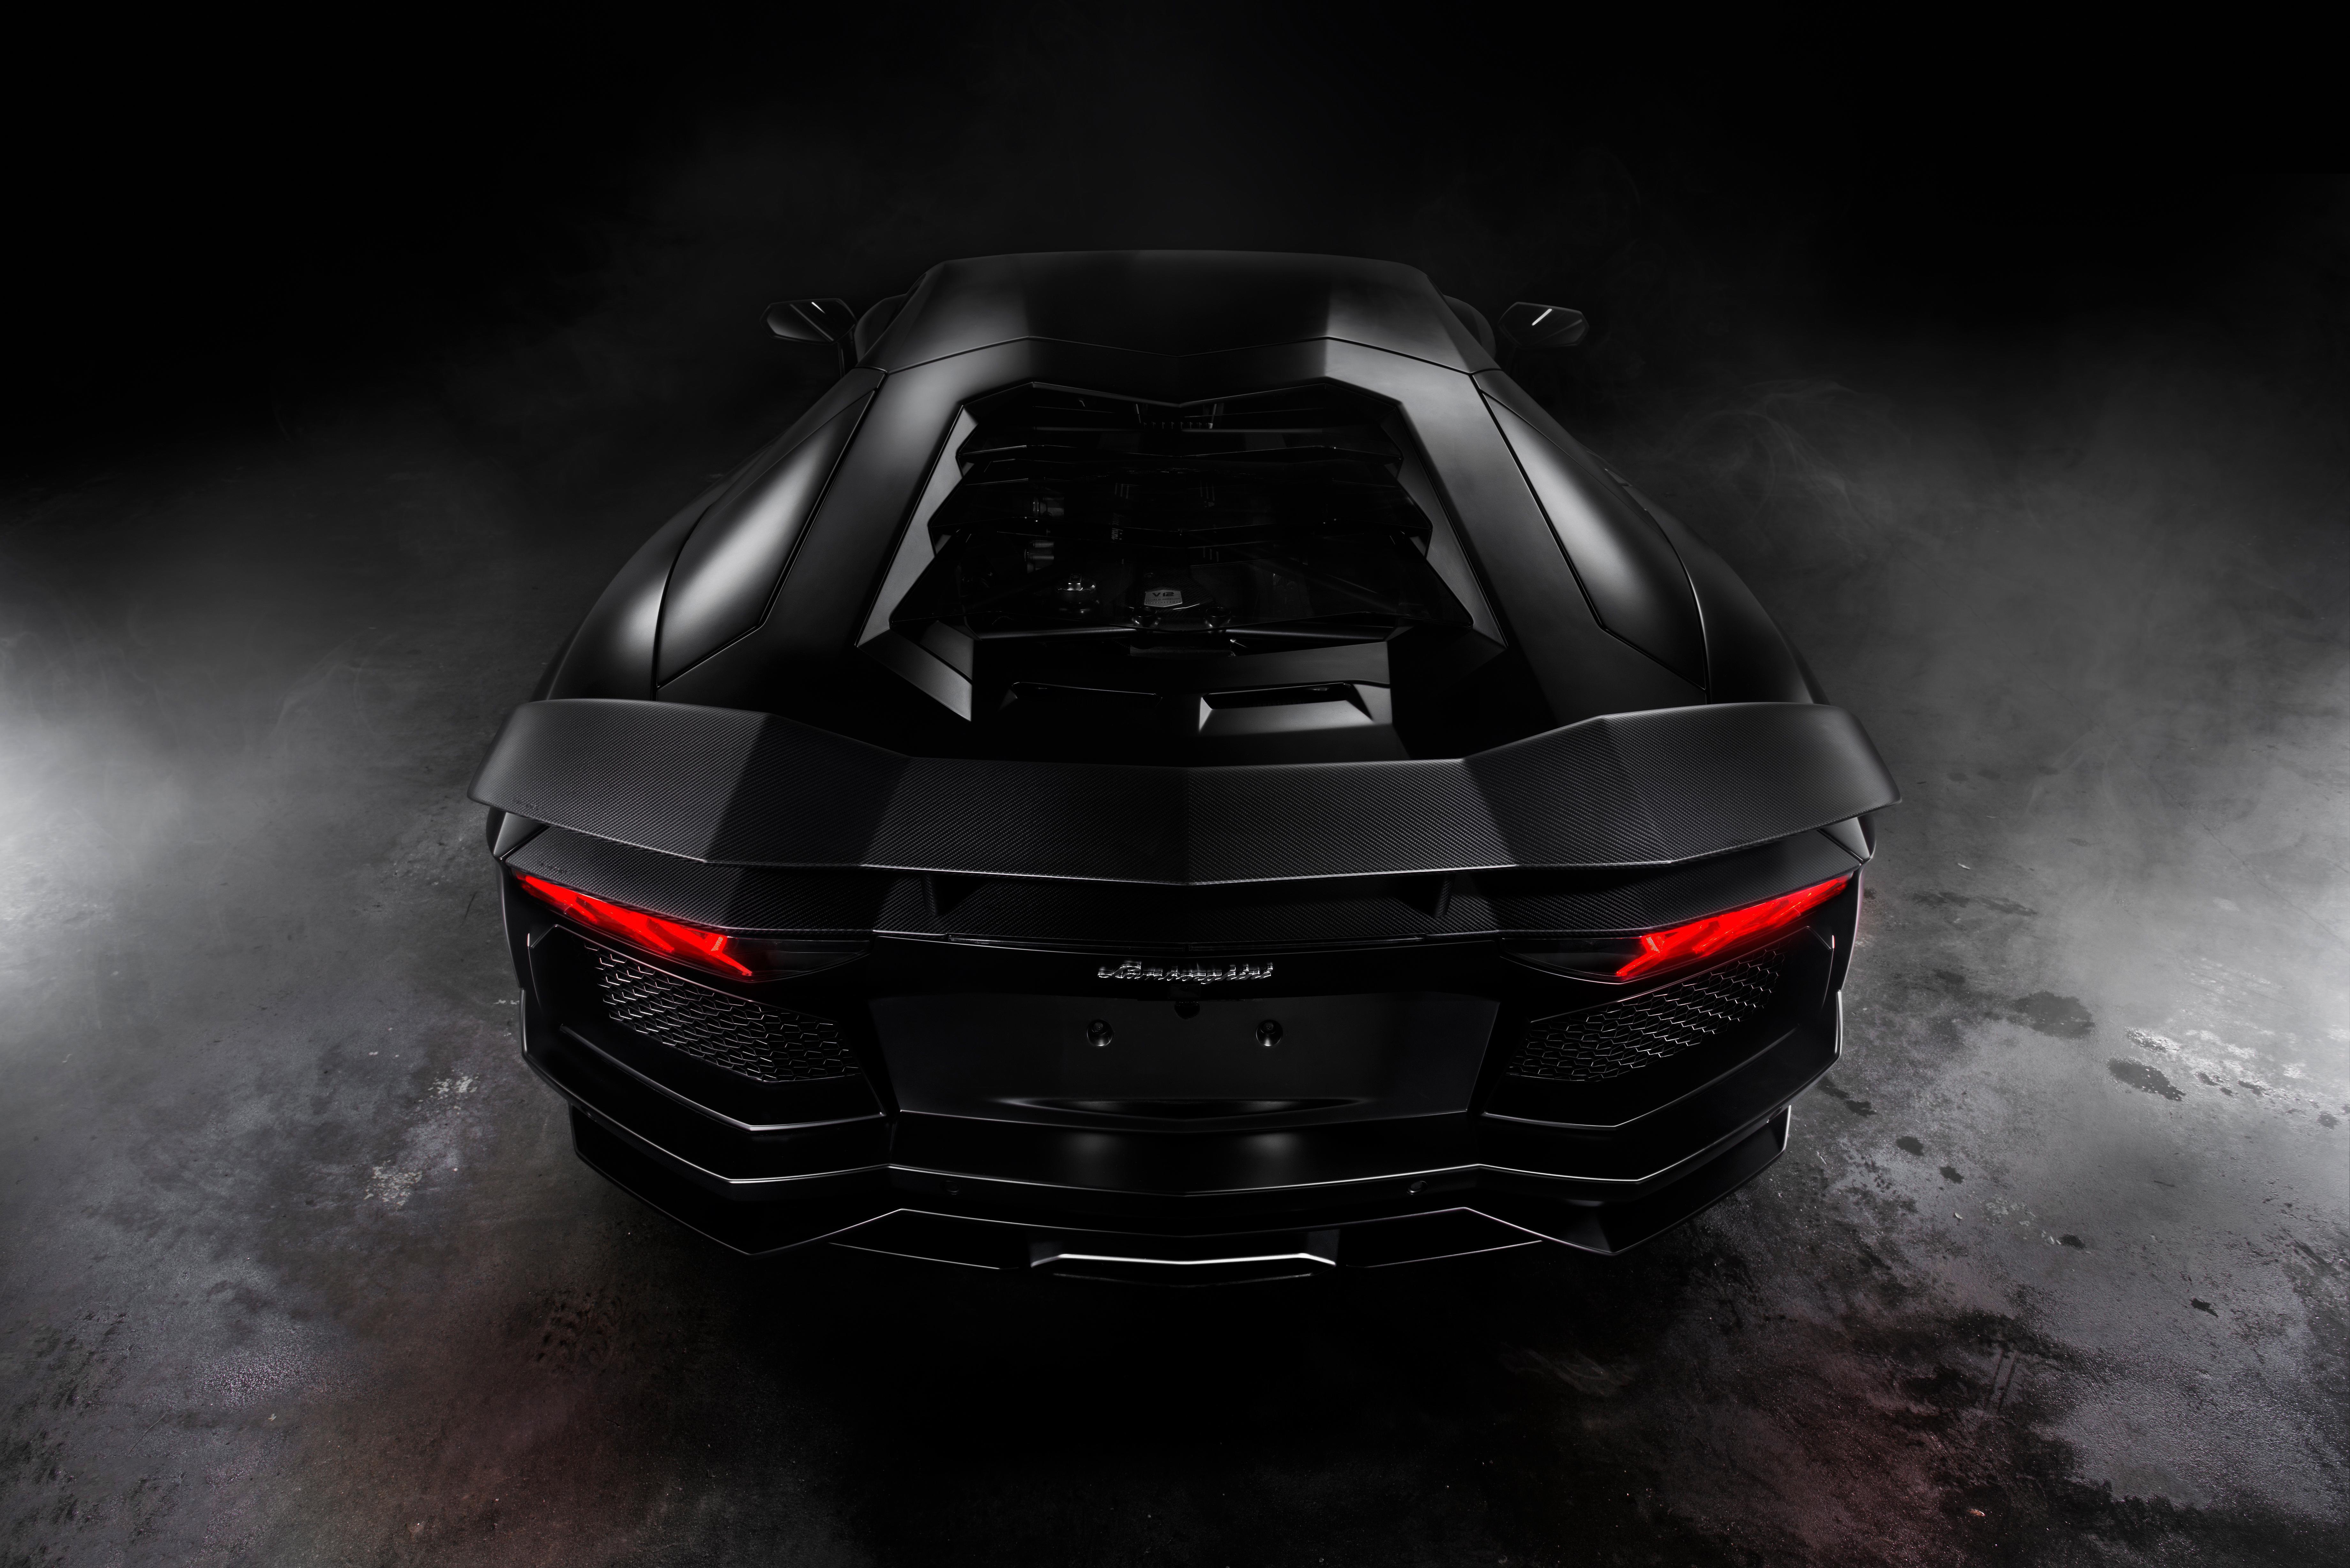 Black Lamborghini Aventador 8k Hd Cars 4k Wallpapers